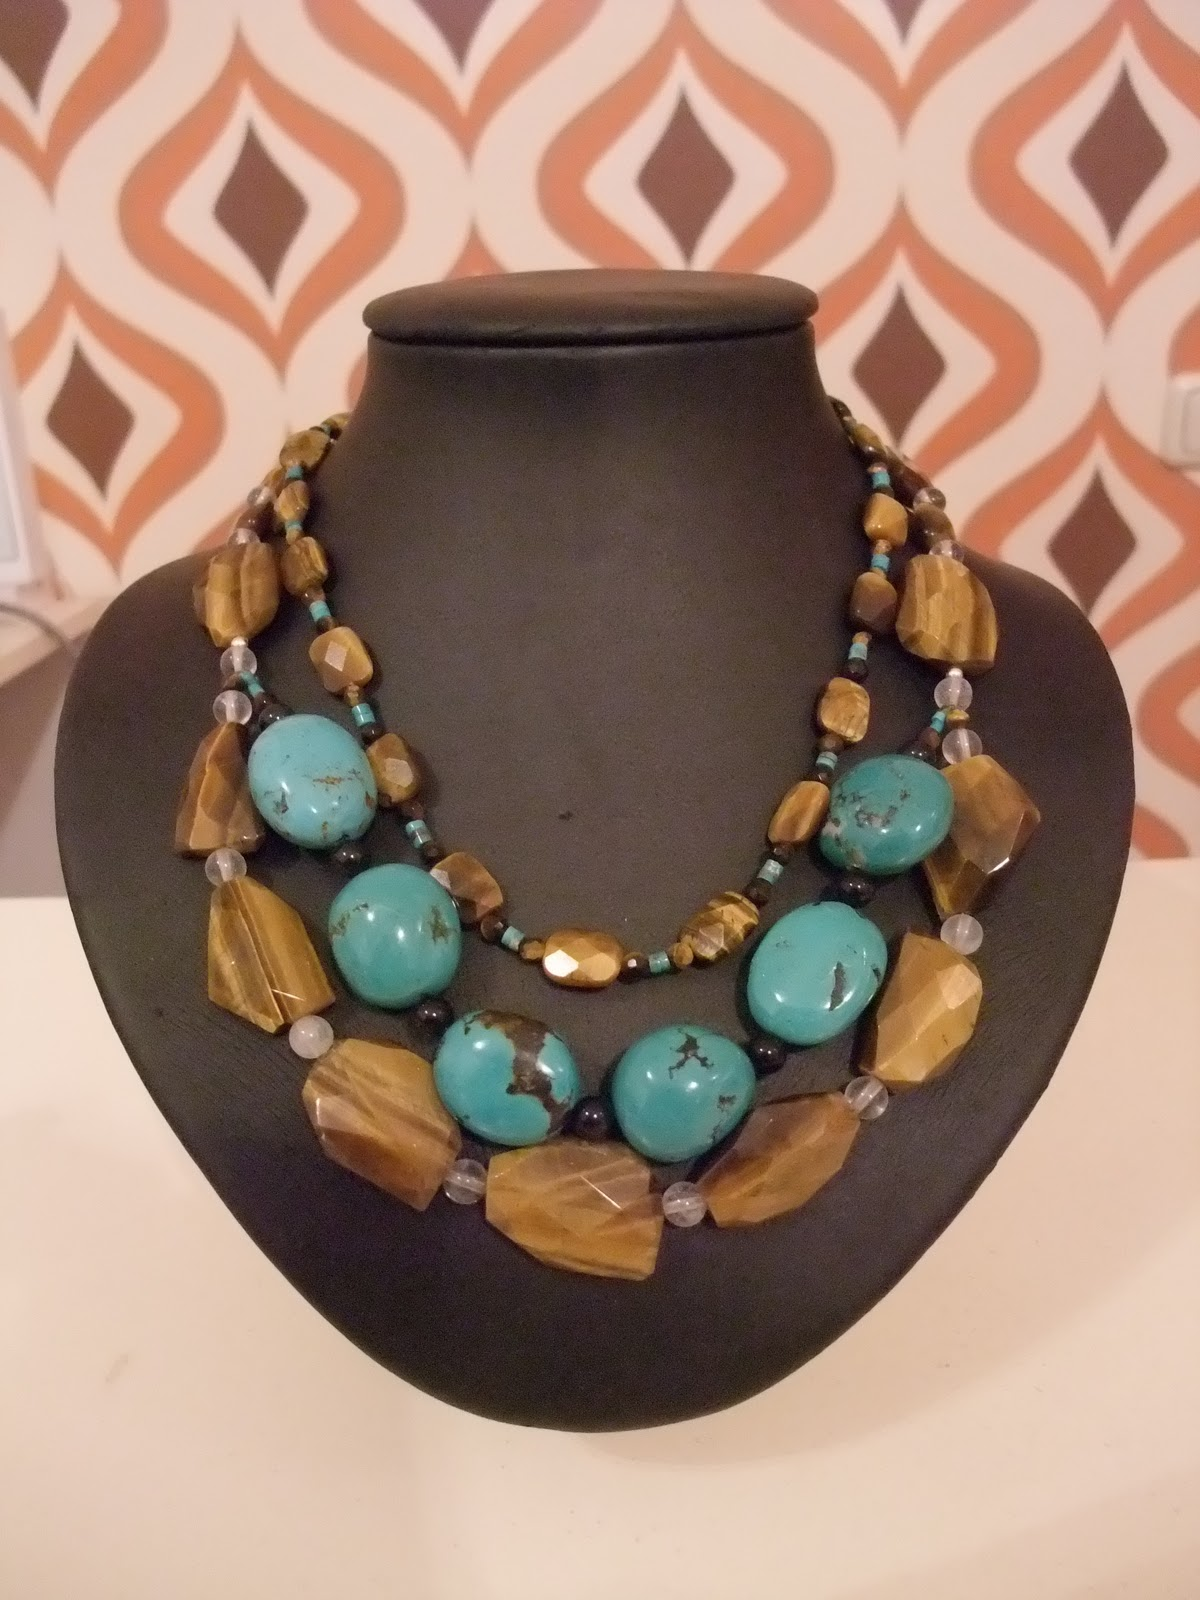 kreative in m nchen twisted sisters jewelry handgefertigter schmuck aus halbedelsteinen silber. Black Bedroom Furniture Sets. Home Design Ideas